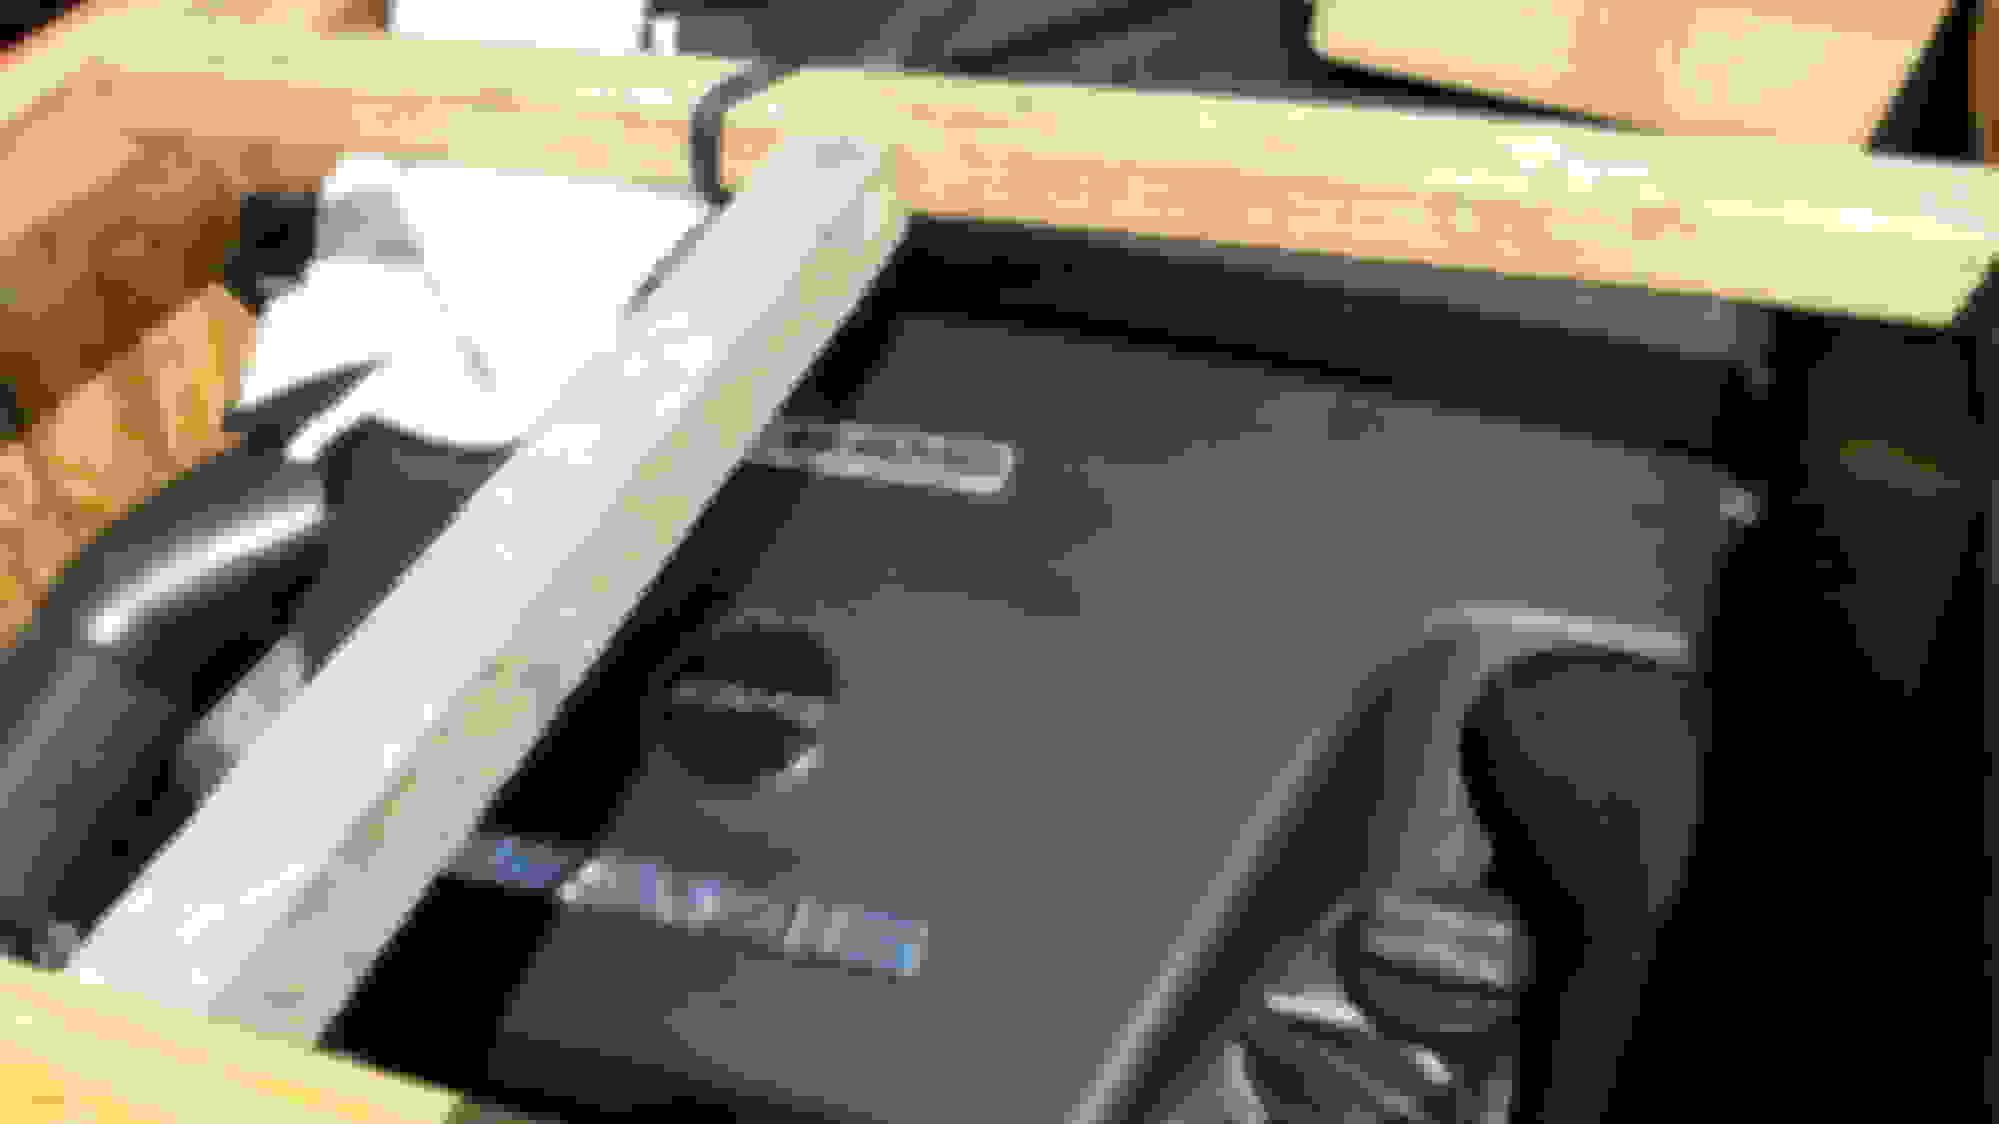 6 speed SLK E55 AMG build thread - MBWorld org Forums